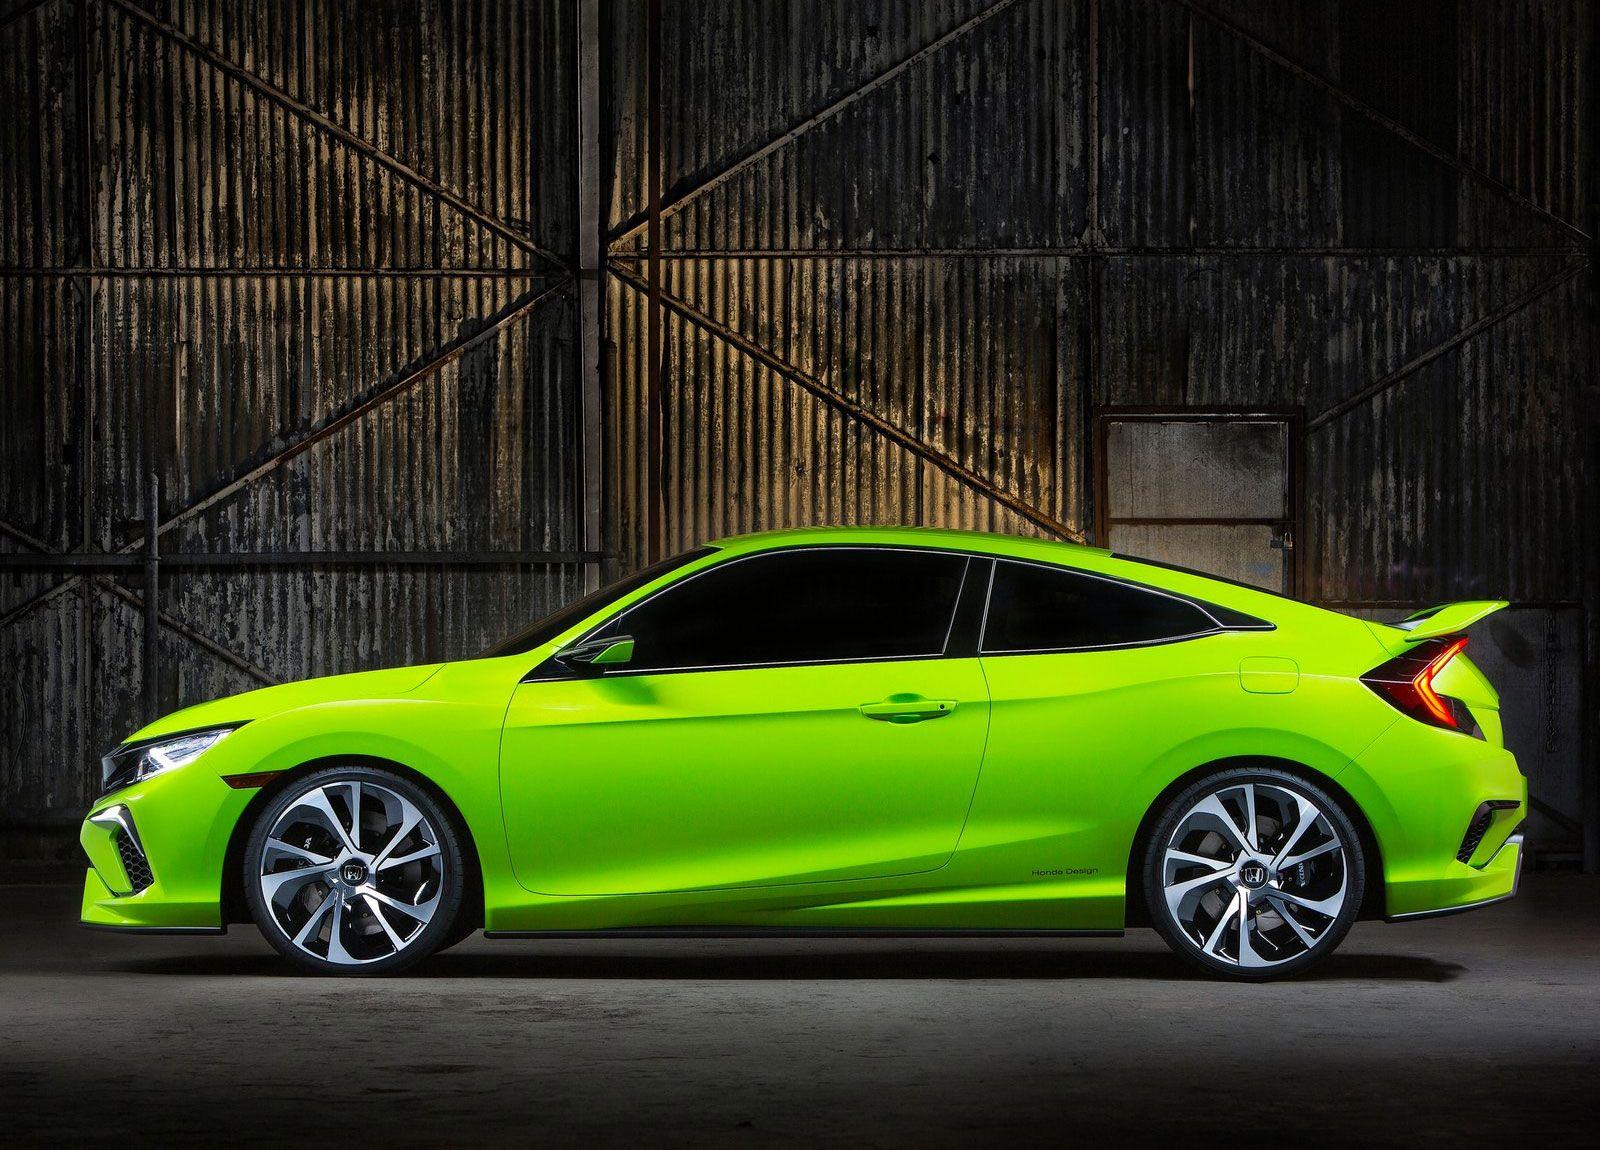 New York 2015 Honda Civic Concept (avec images) Honda